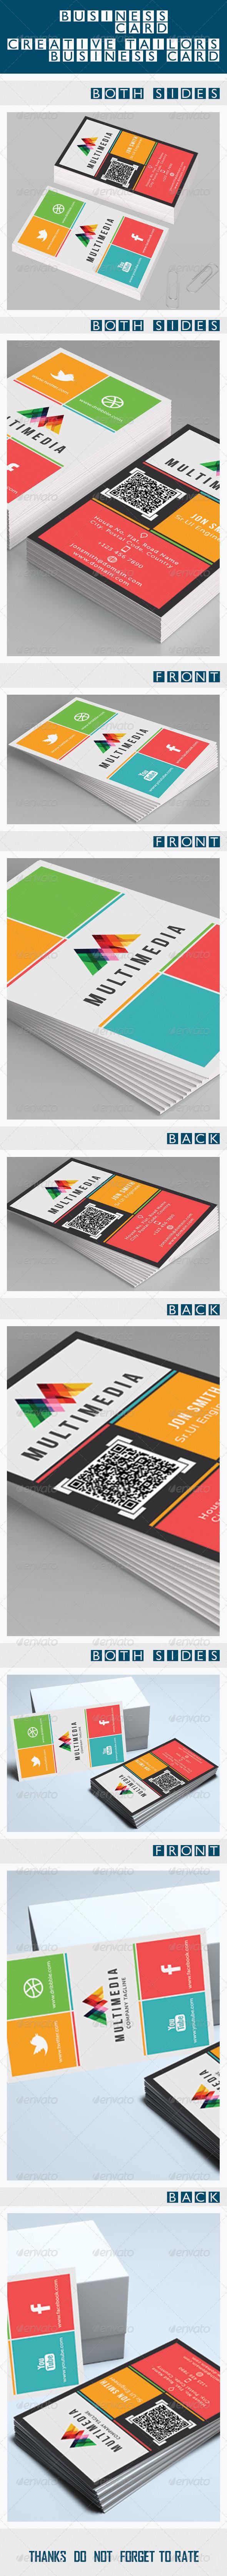 Metro Design Business Card - Creative Business Cards